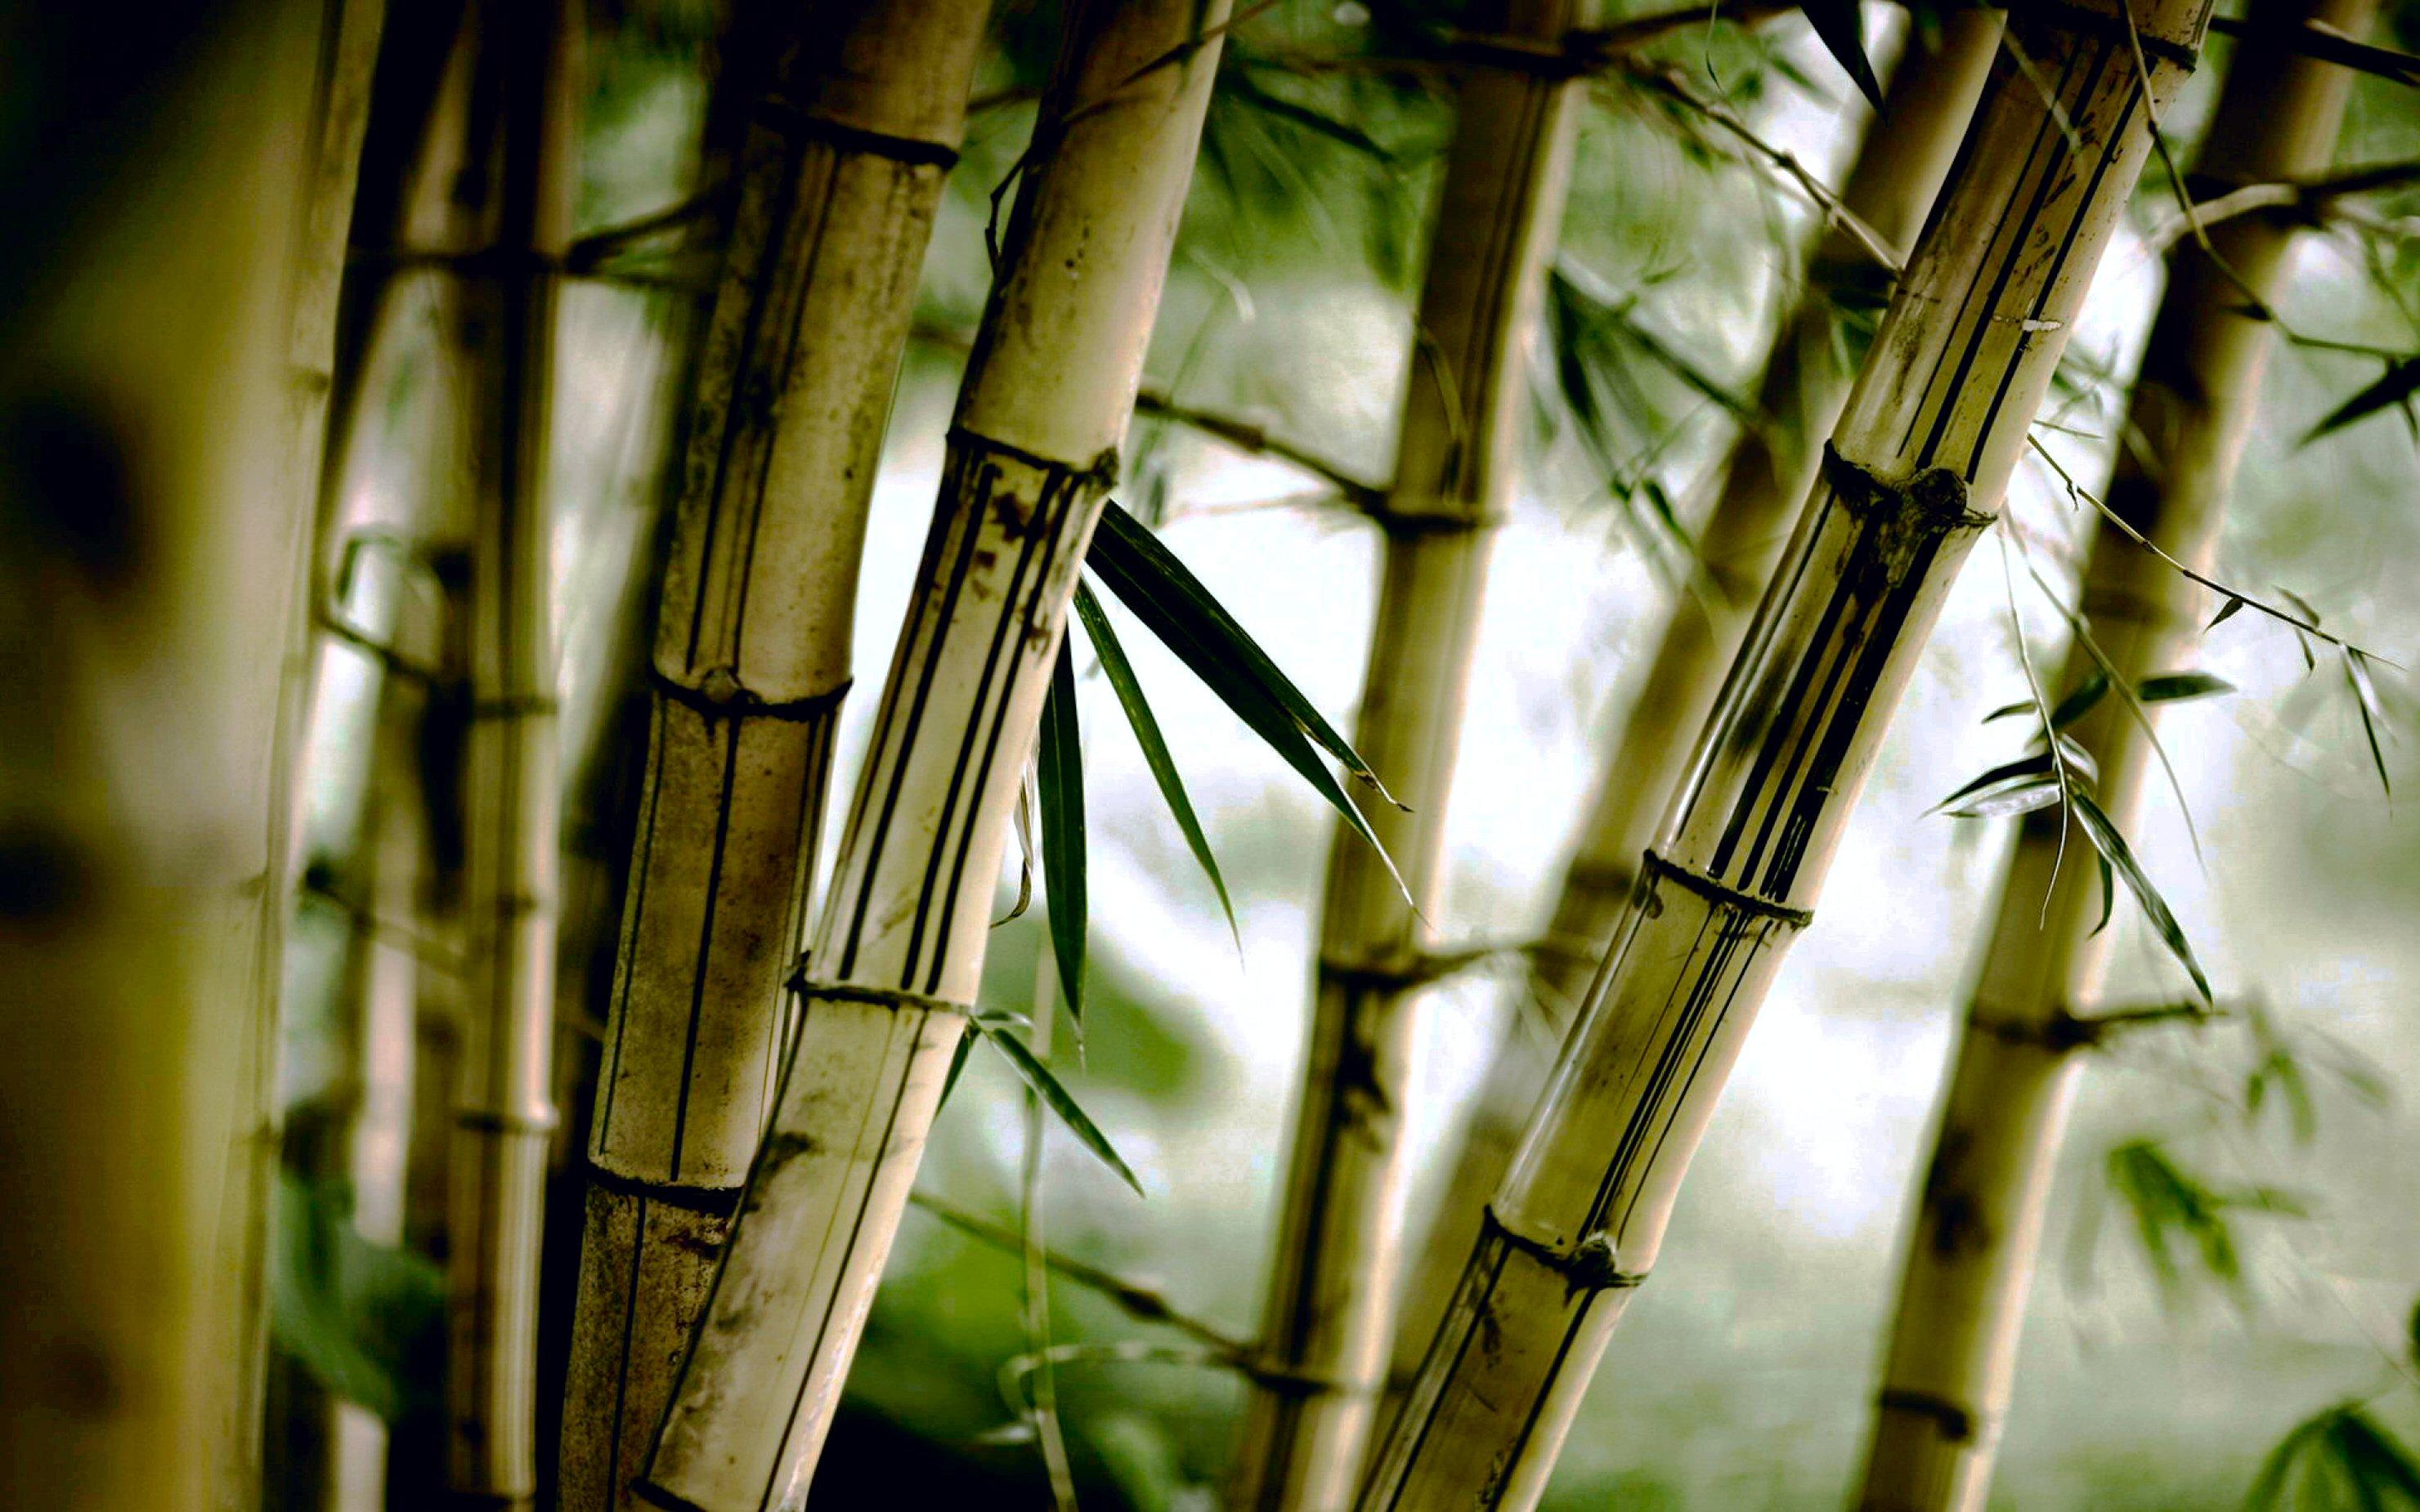 99 bamboo hd wallpapers